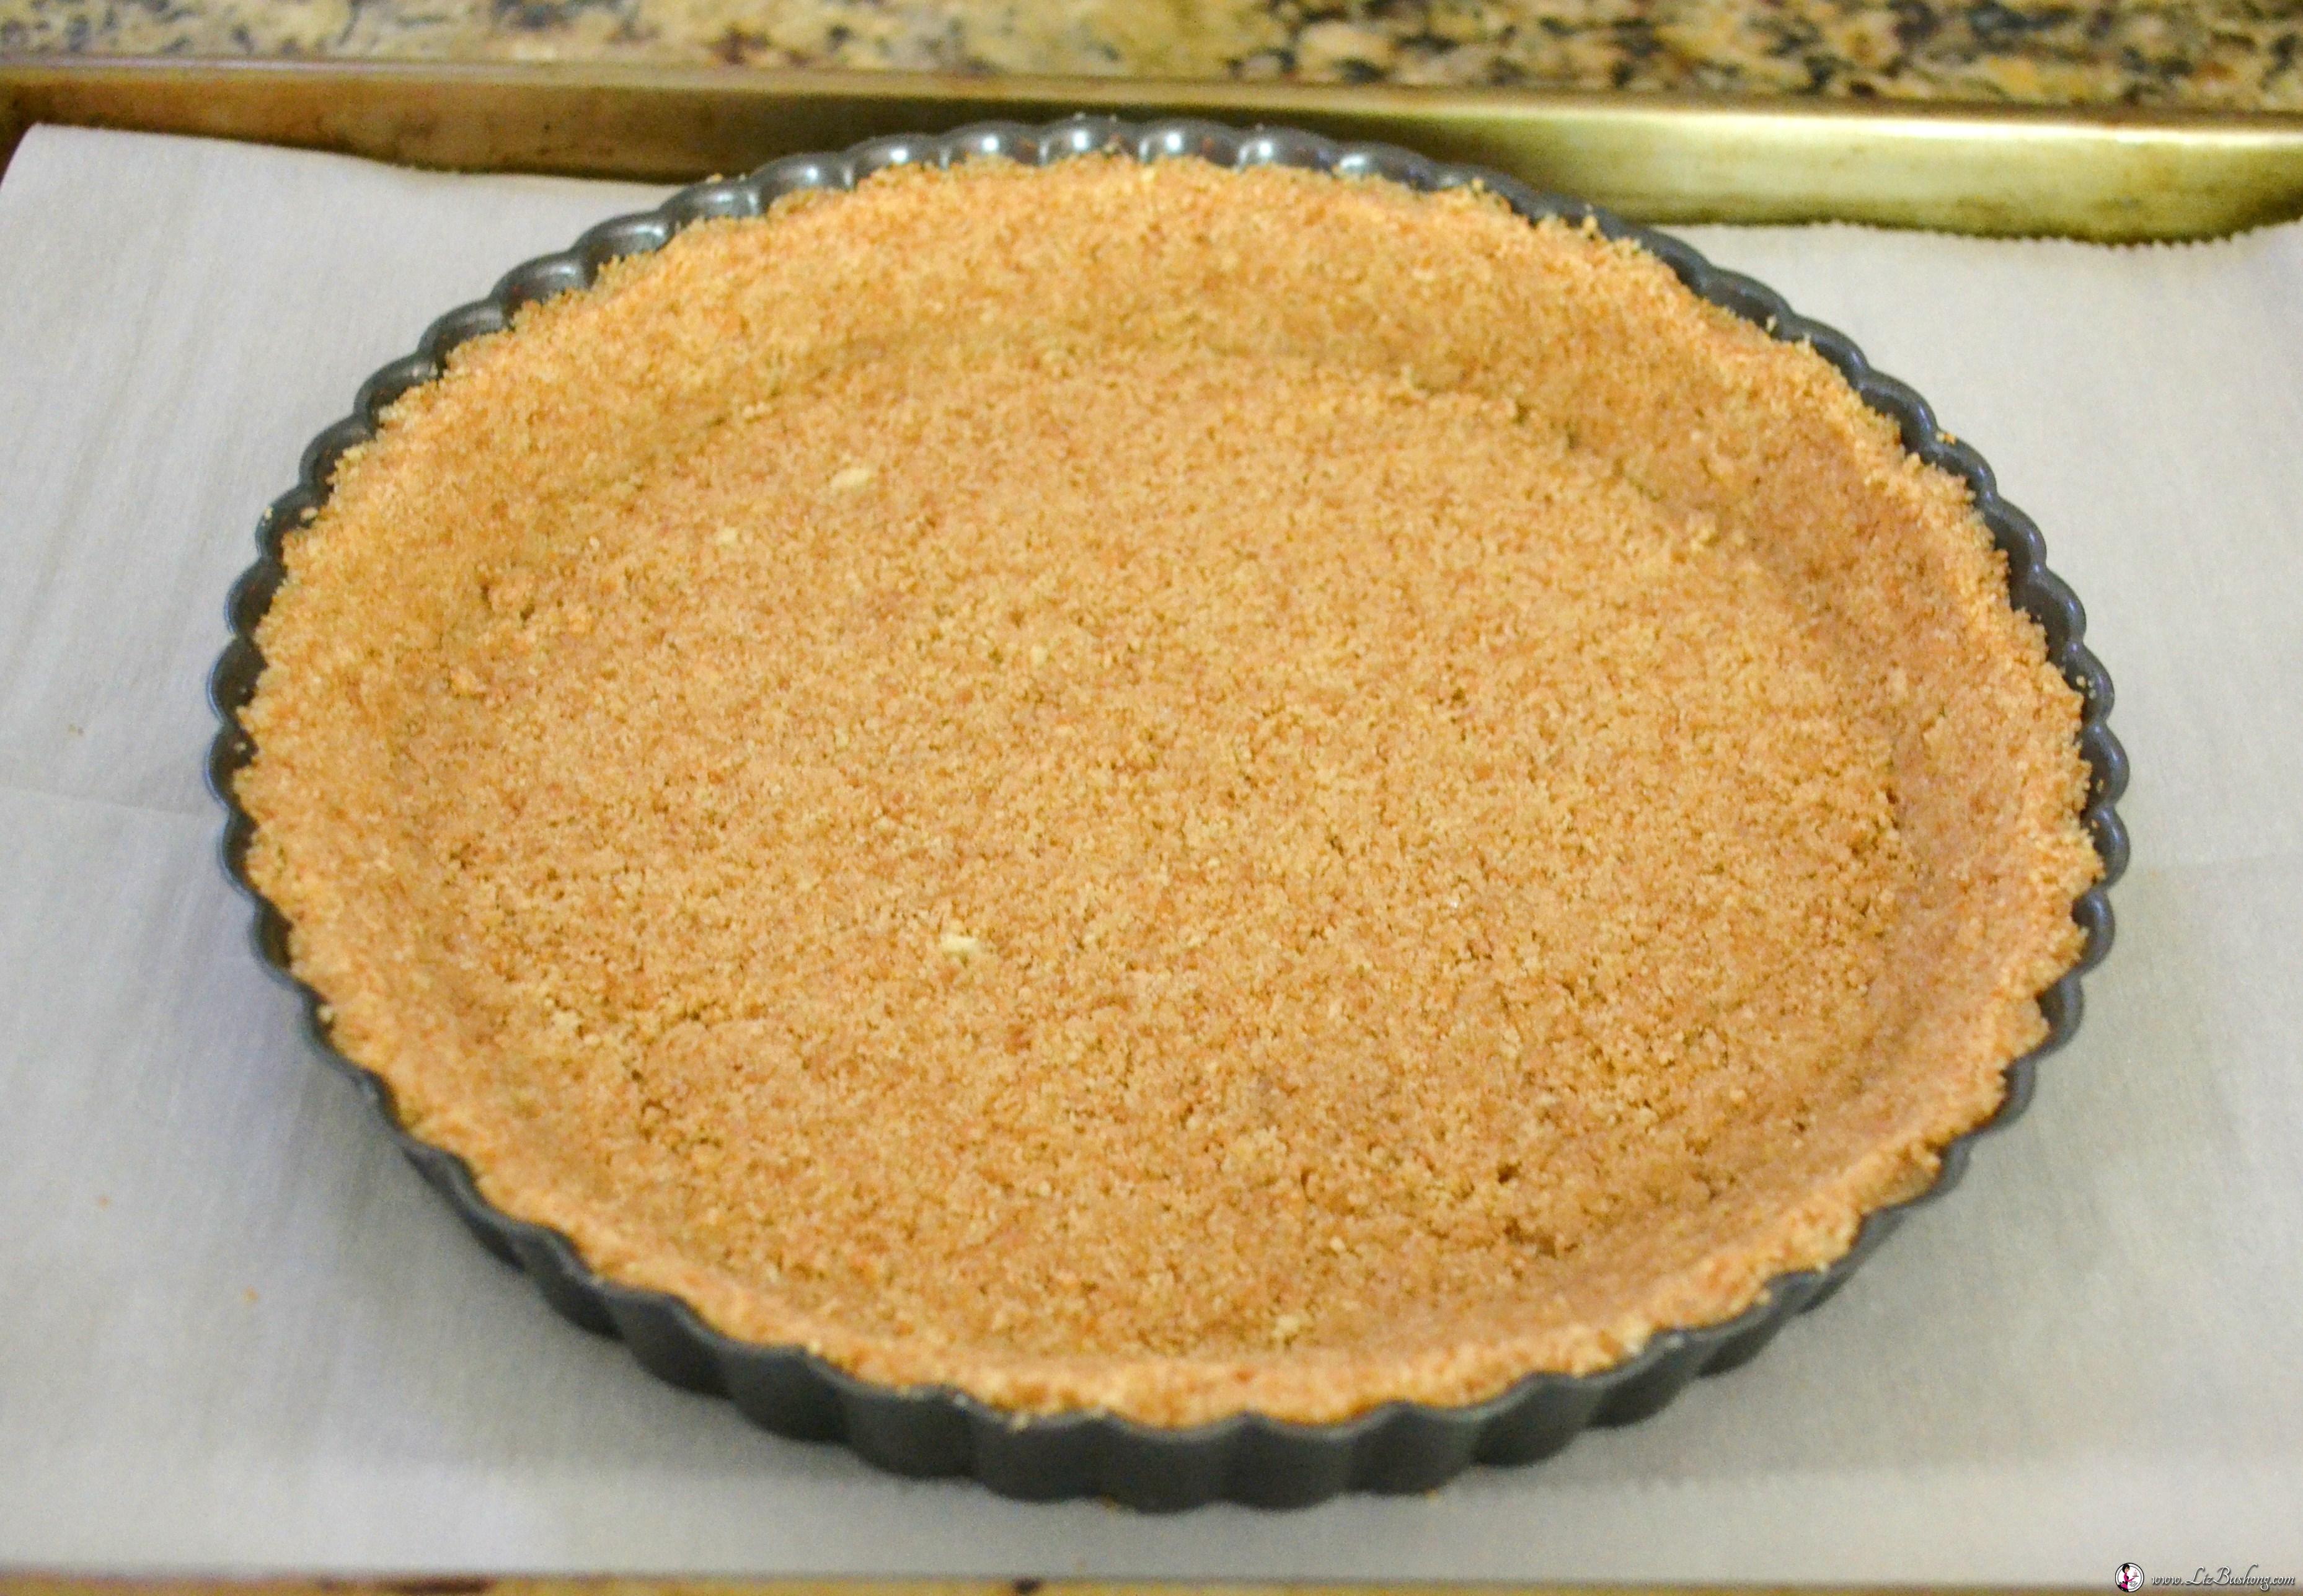 Versatile Crumb Crust Recipe| crust-www.lizbushong.com